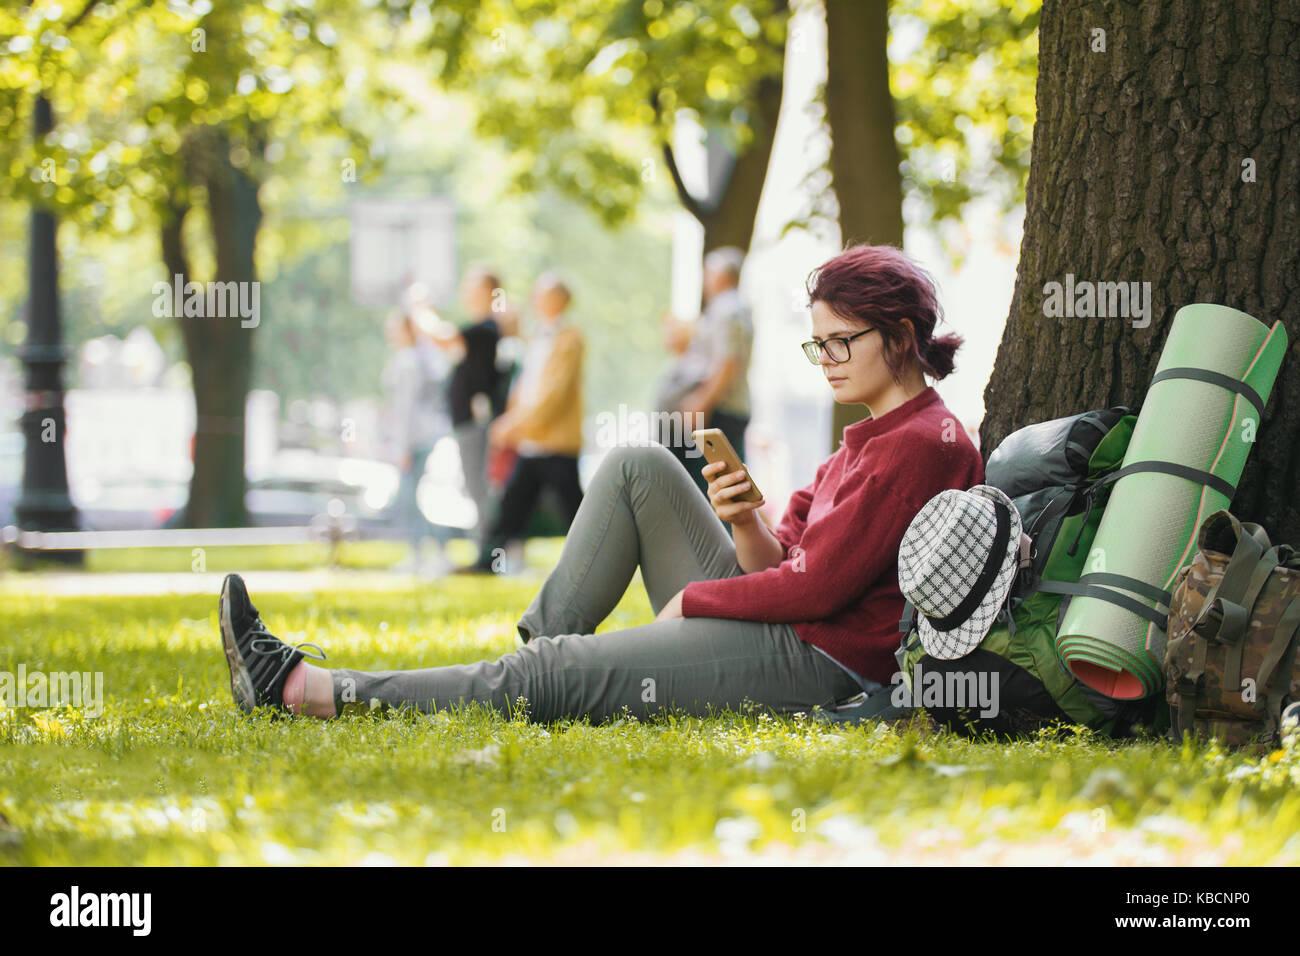 Sac à dos fille adolescente avec tourisme looking at smartphone in city park Photo Stock